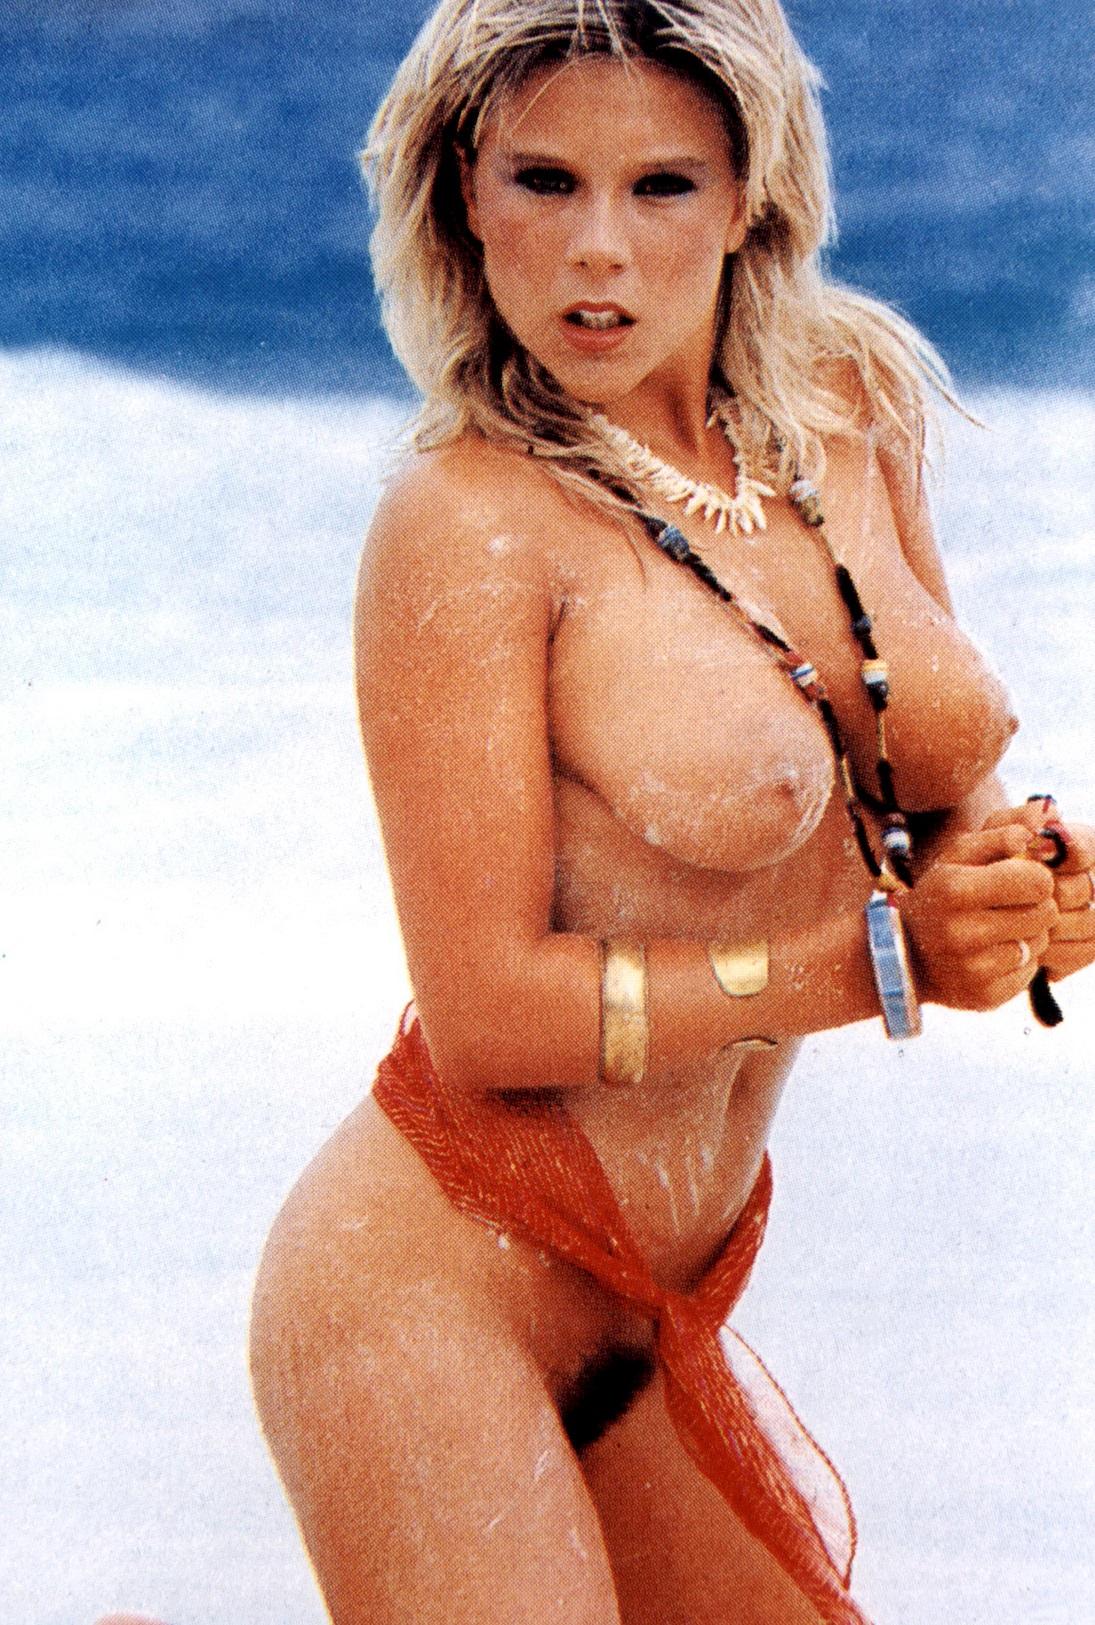 porn in the water gifs xxx sex